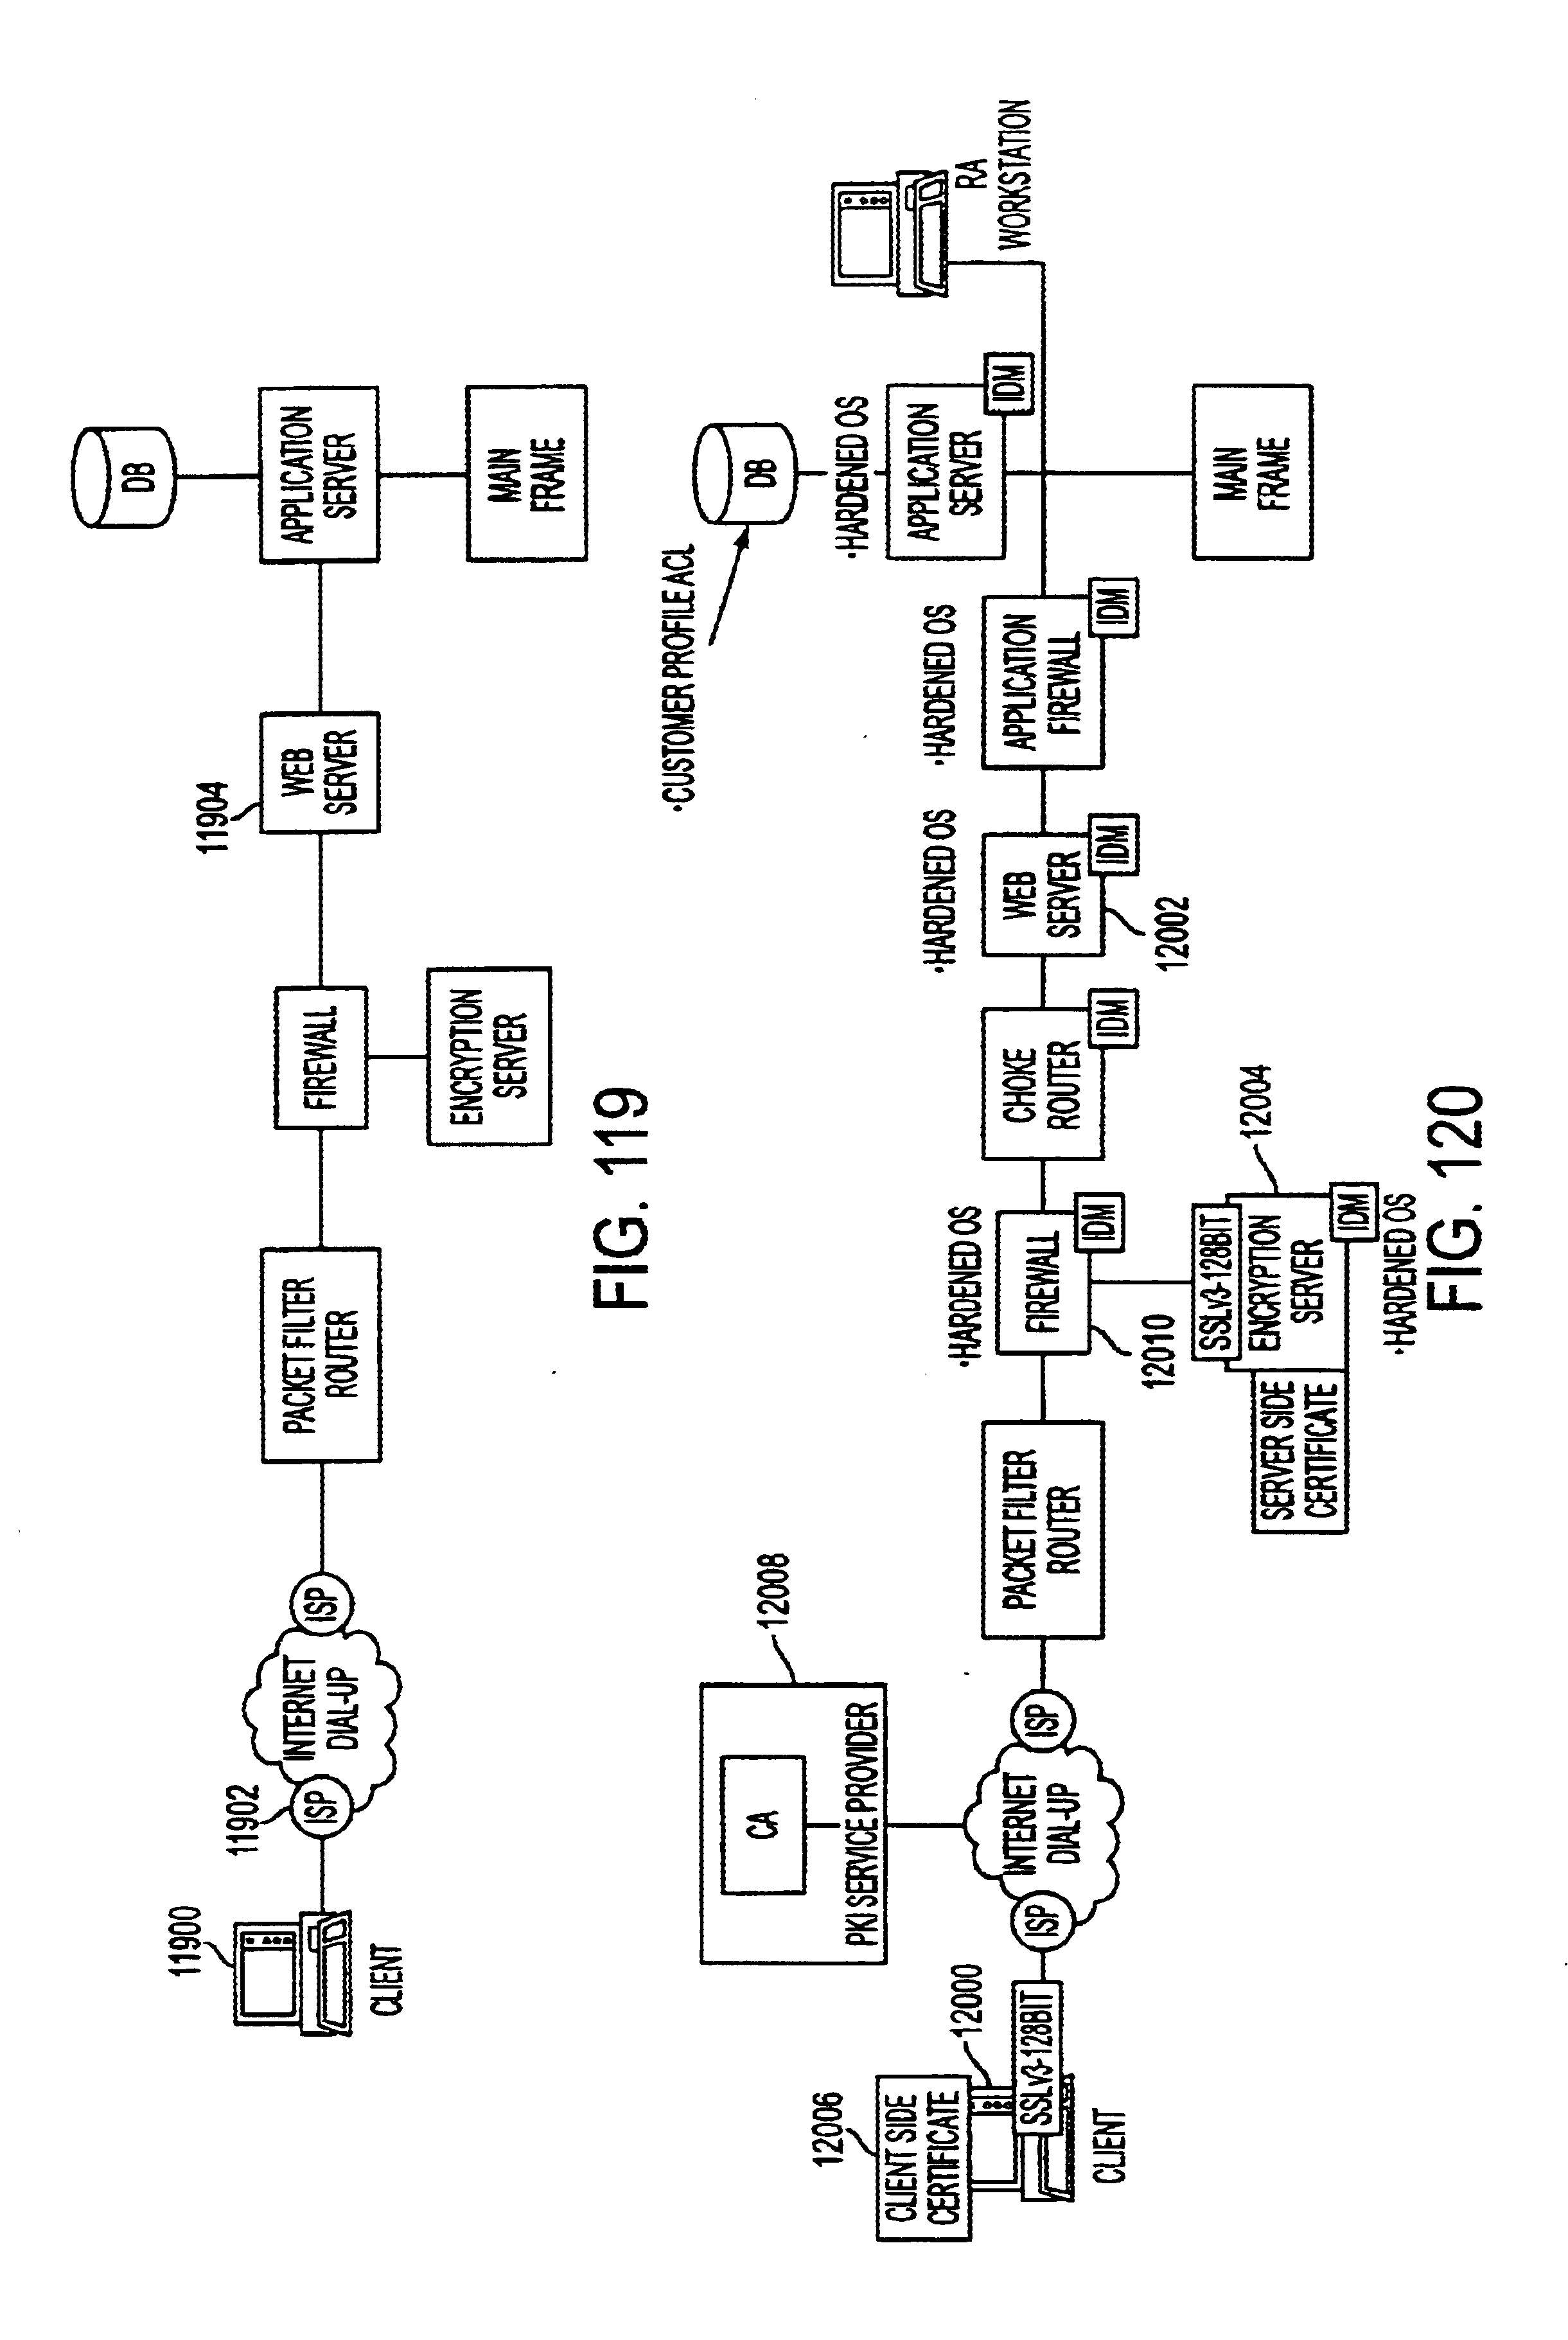 Patent Us 6671818 B1 Fish Caller Electronics Circuit Images